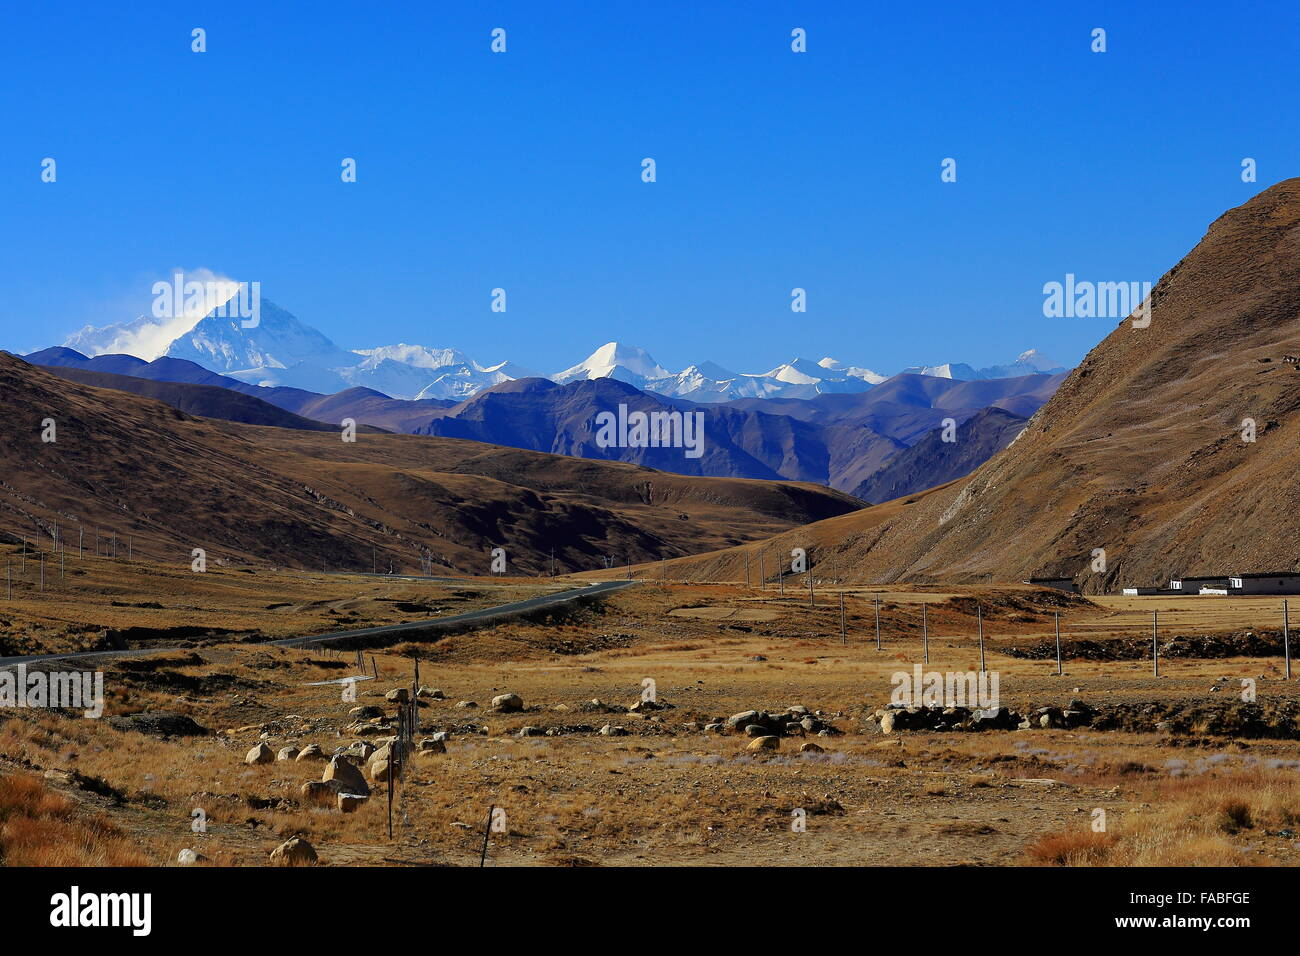 L.to R. Lhotse 8516ms. Chomolungma-Holy Mother-Everest 8844 ms. Nuptse W.Peak 7861 ms. Changtse N.Peak 7543 ms. - Stock Image